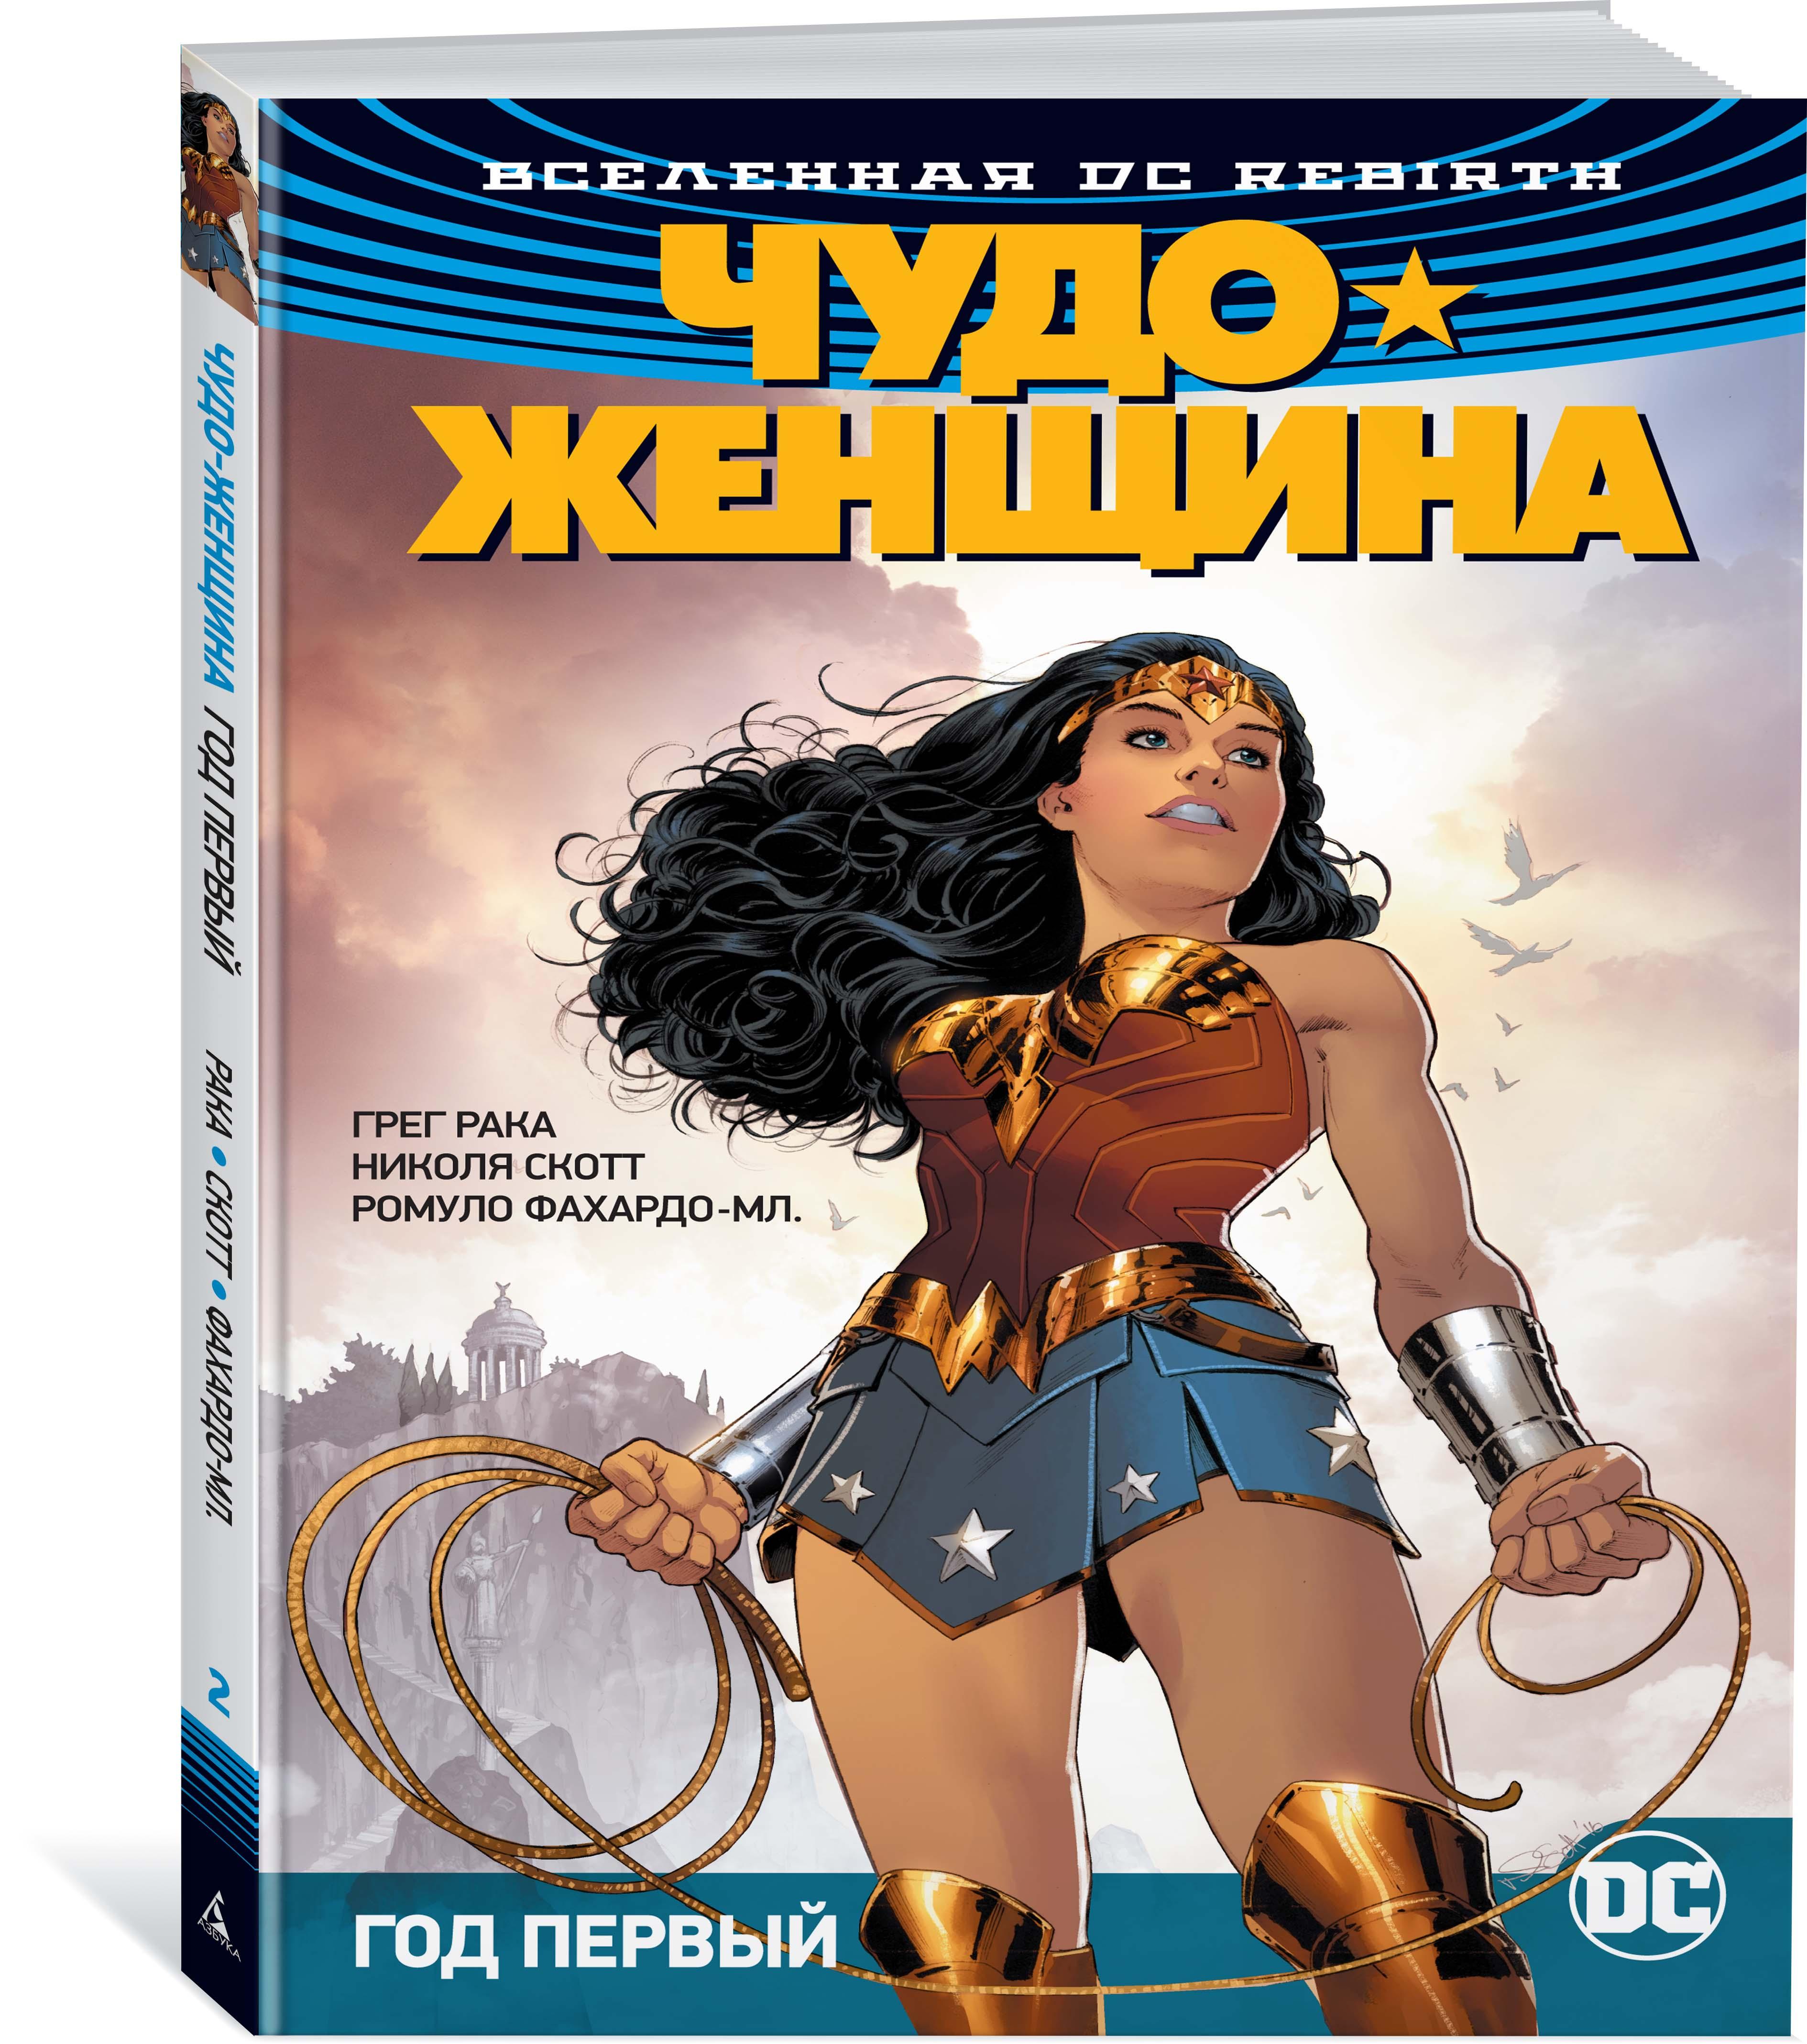 Грег Рака Вселенная DC. Rebirth. Чудо-Женщина. Кн. 2. Год первый рака г вселенная dc rebirth чудо женщина книга 1 ложь графический роман